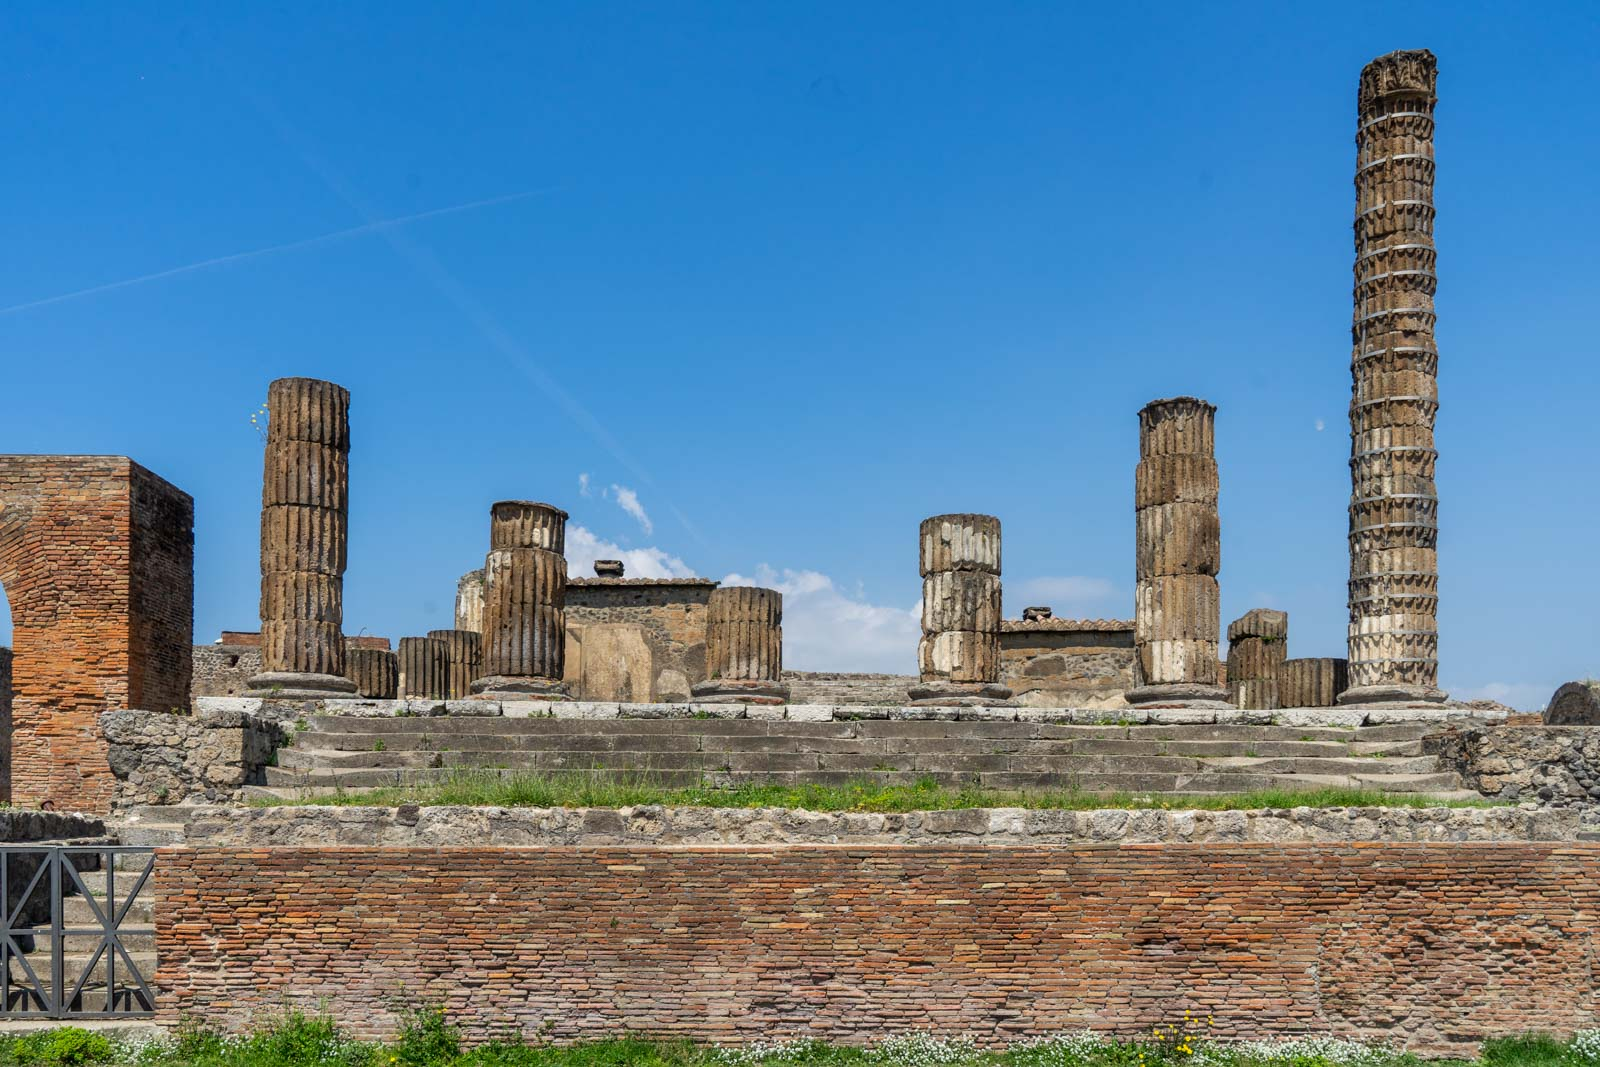 Temple of Jupiter, Pompeii, Italy